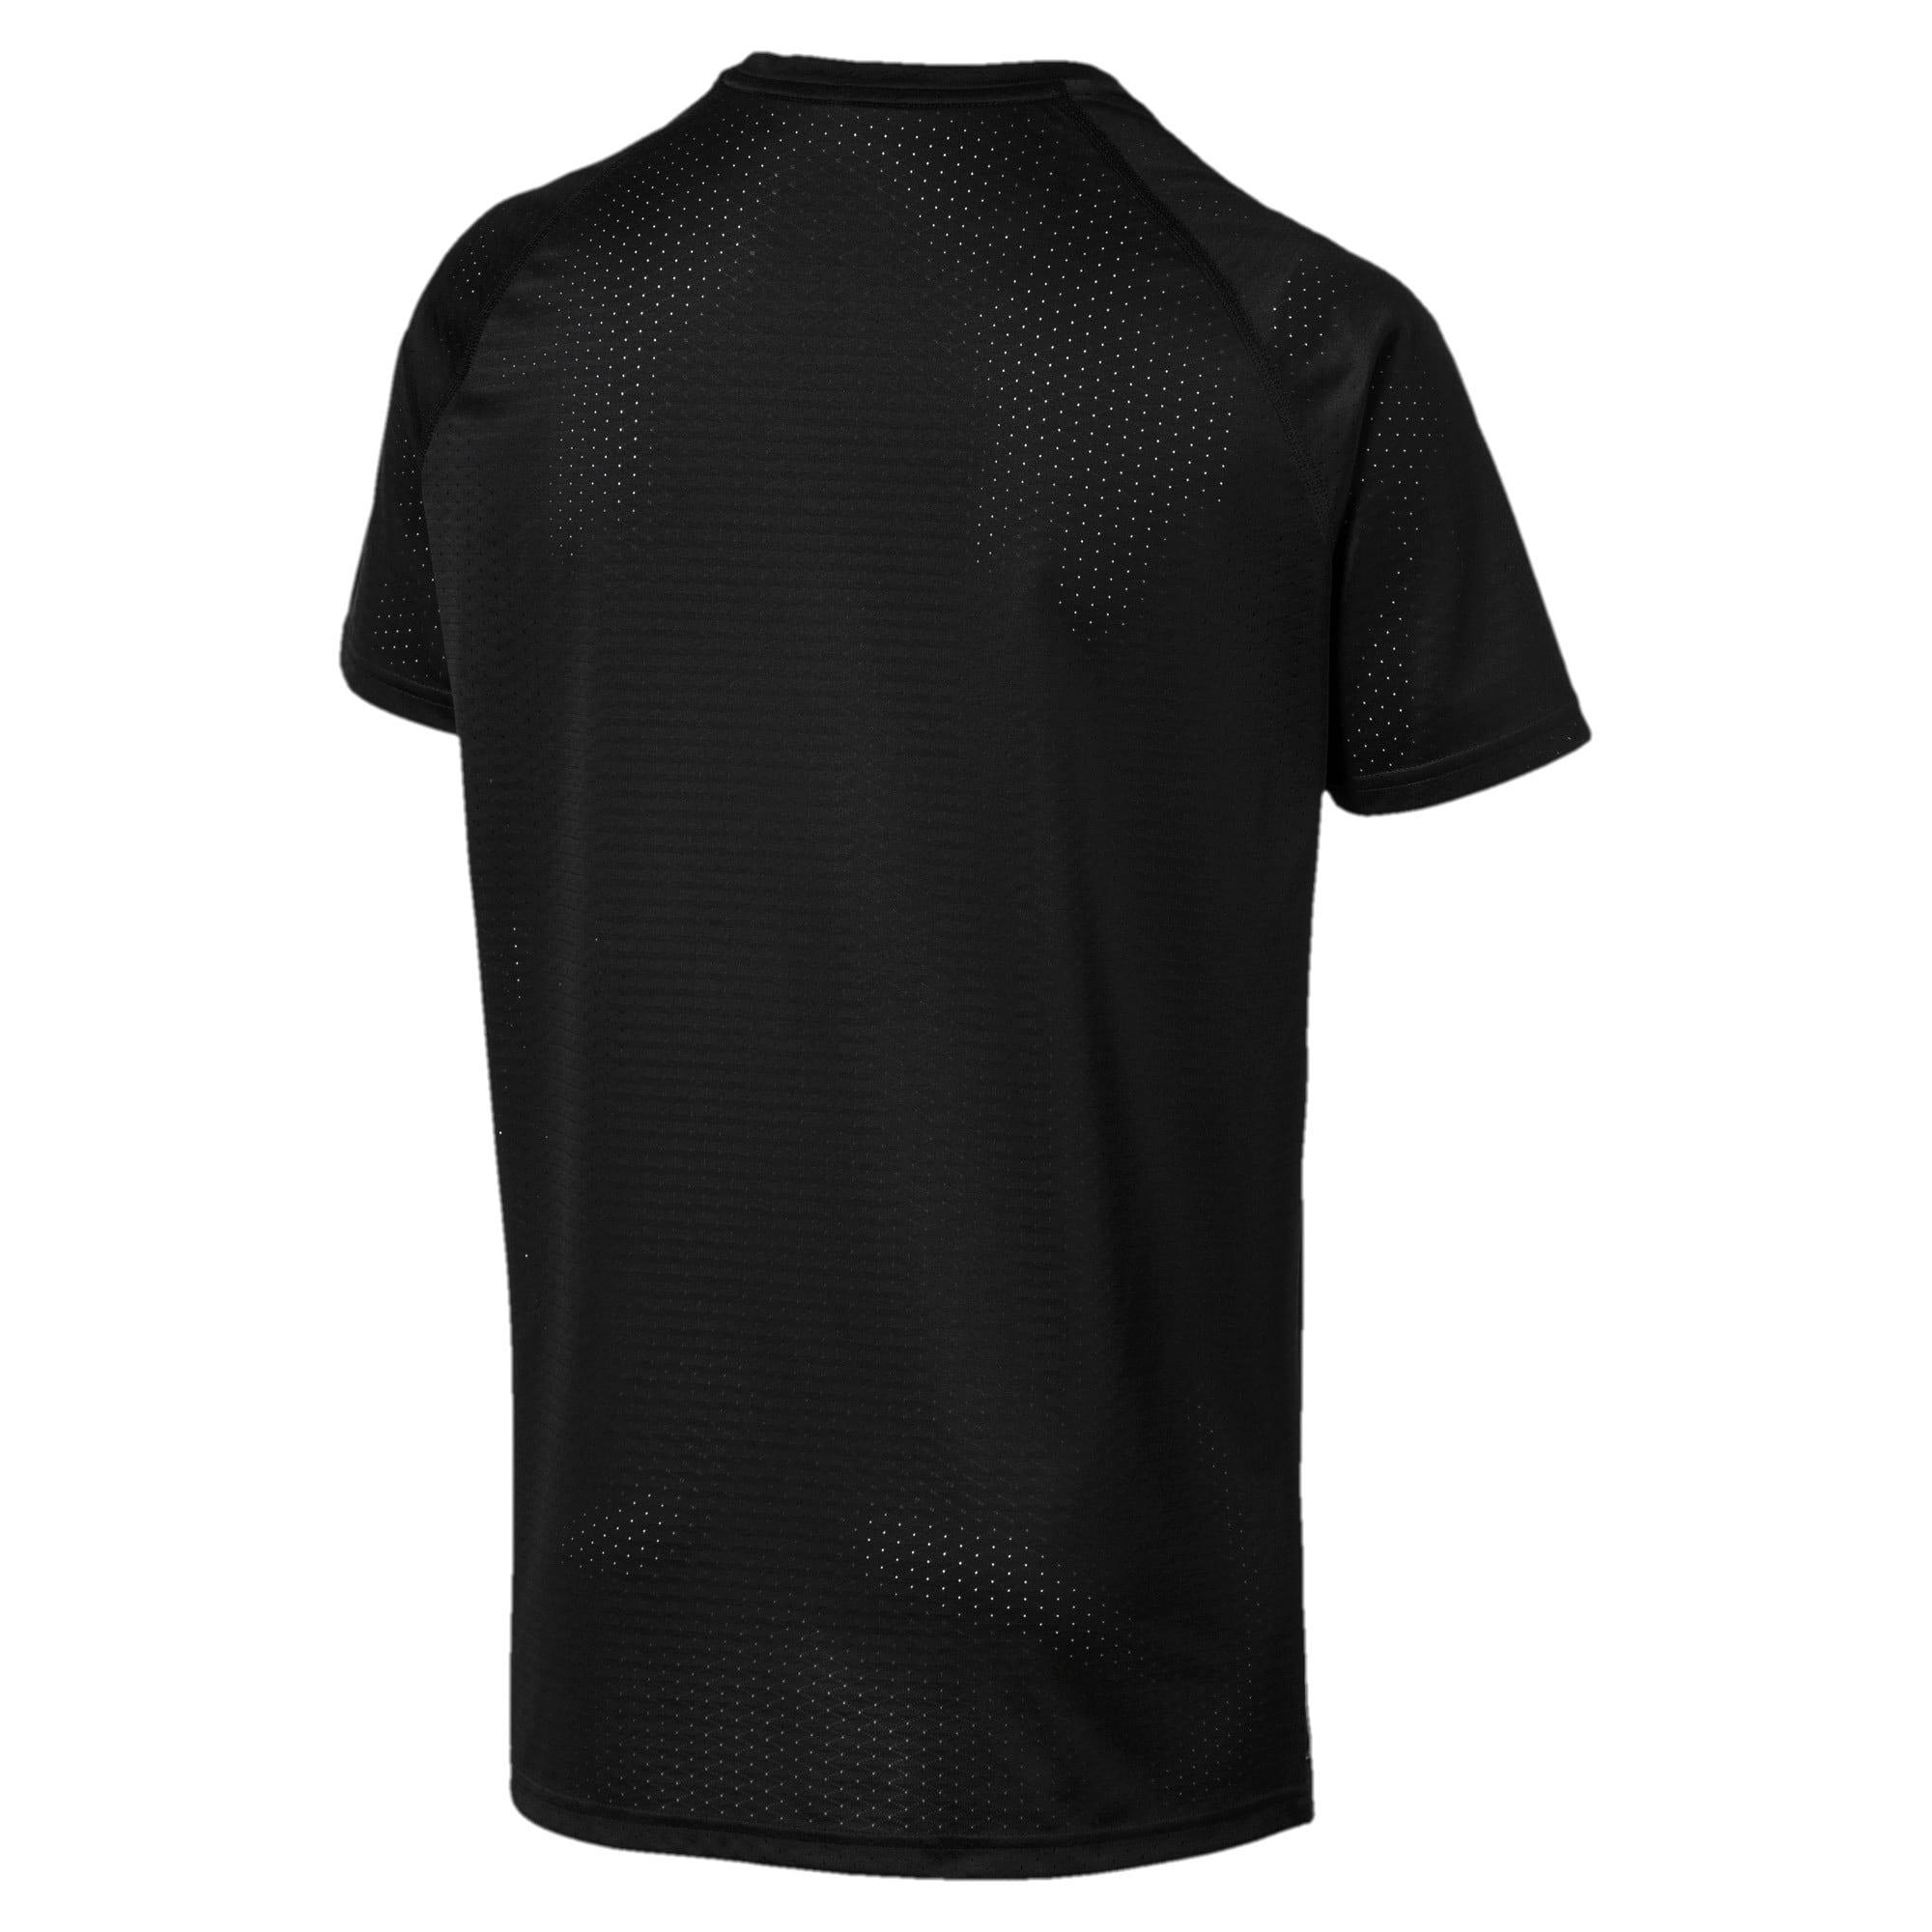 Thumbnail 5 of Tech Herren Training T-Shirt, Puma Black, medium